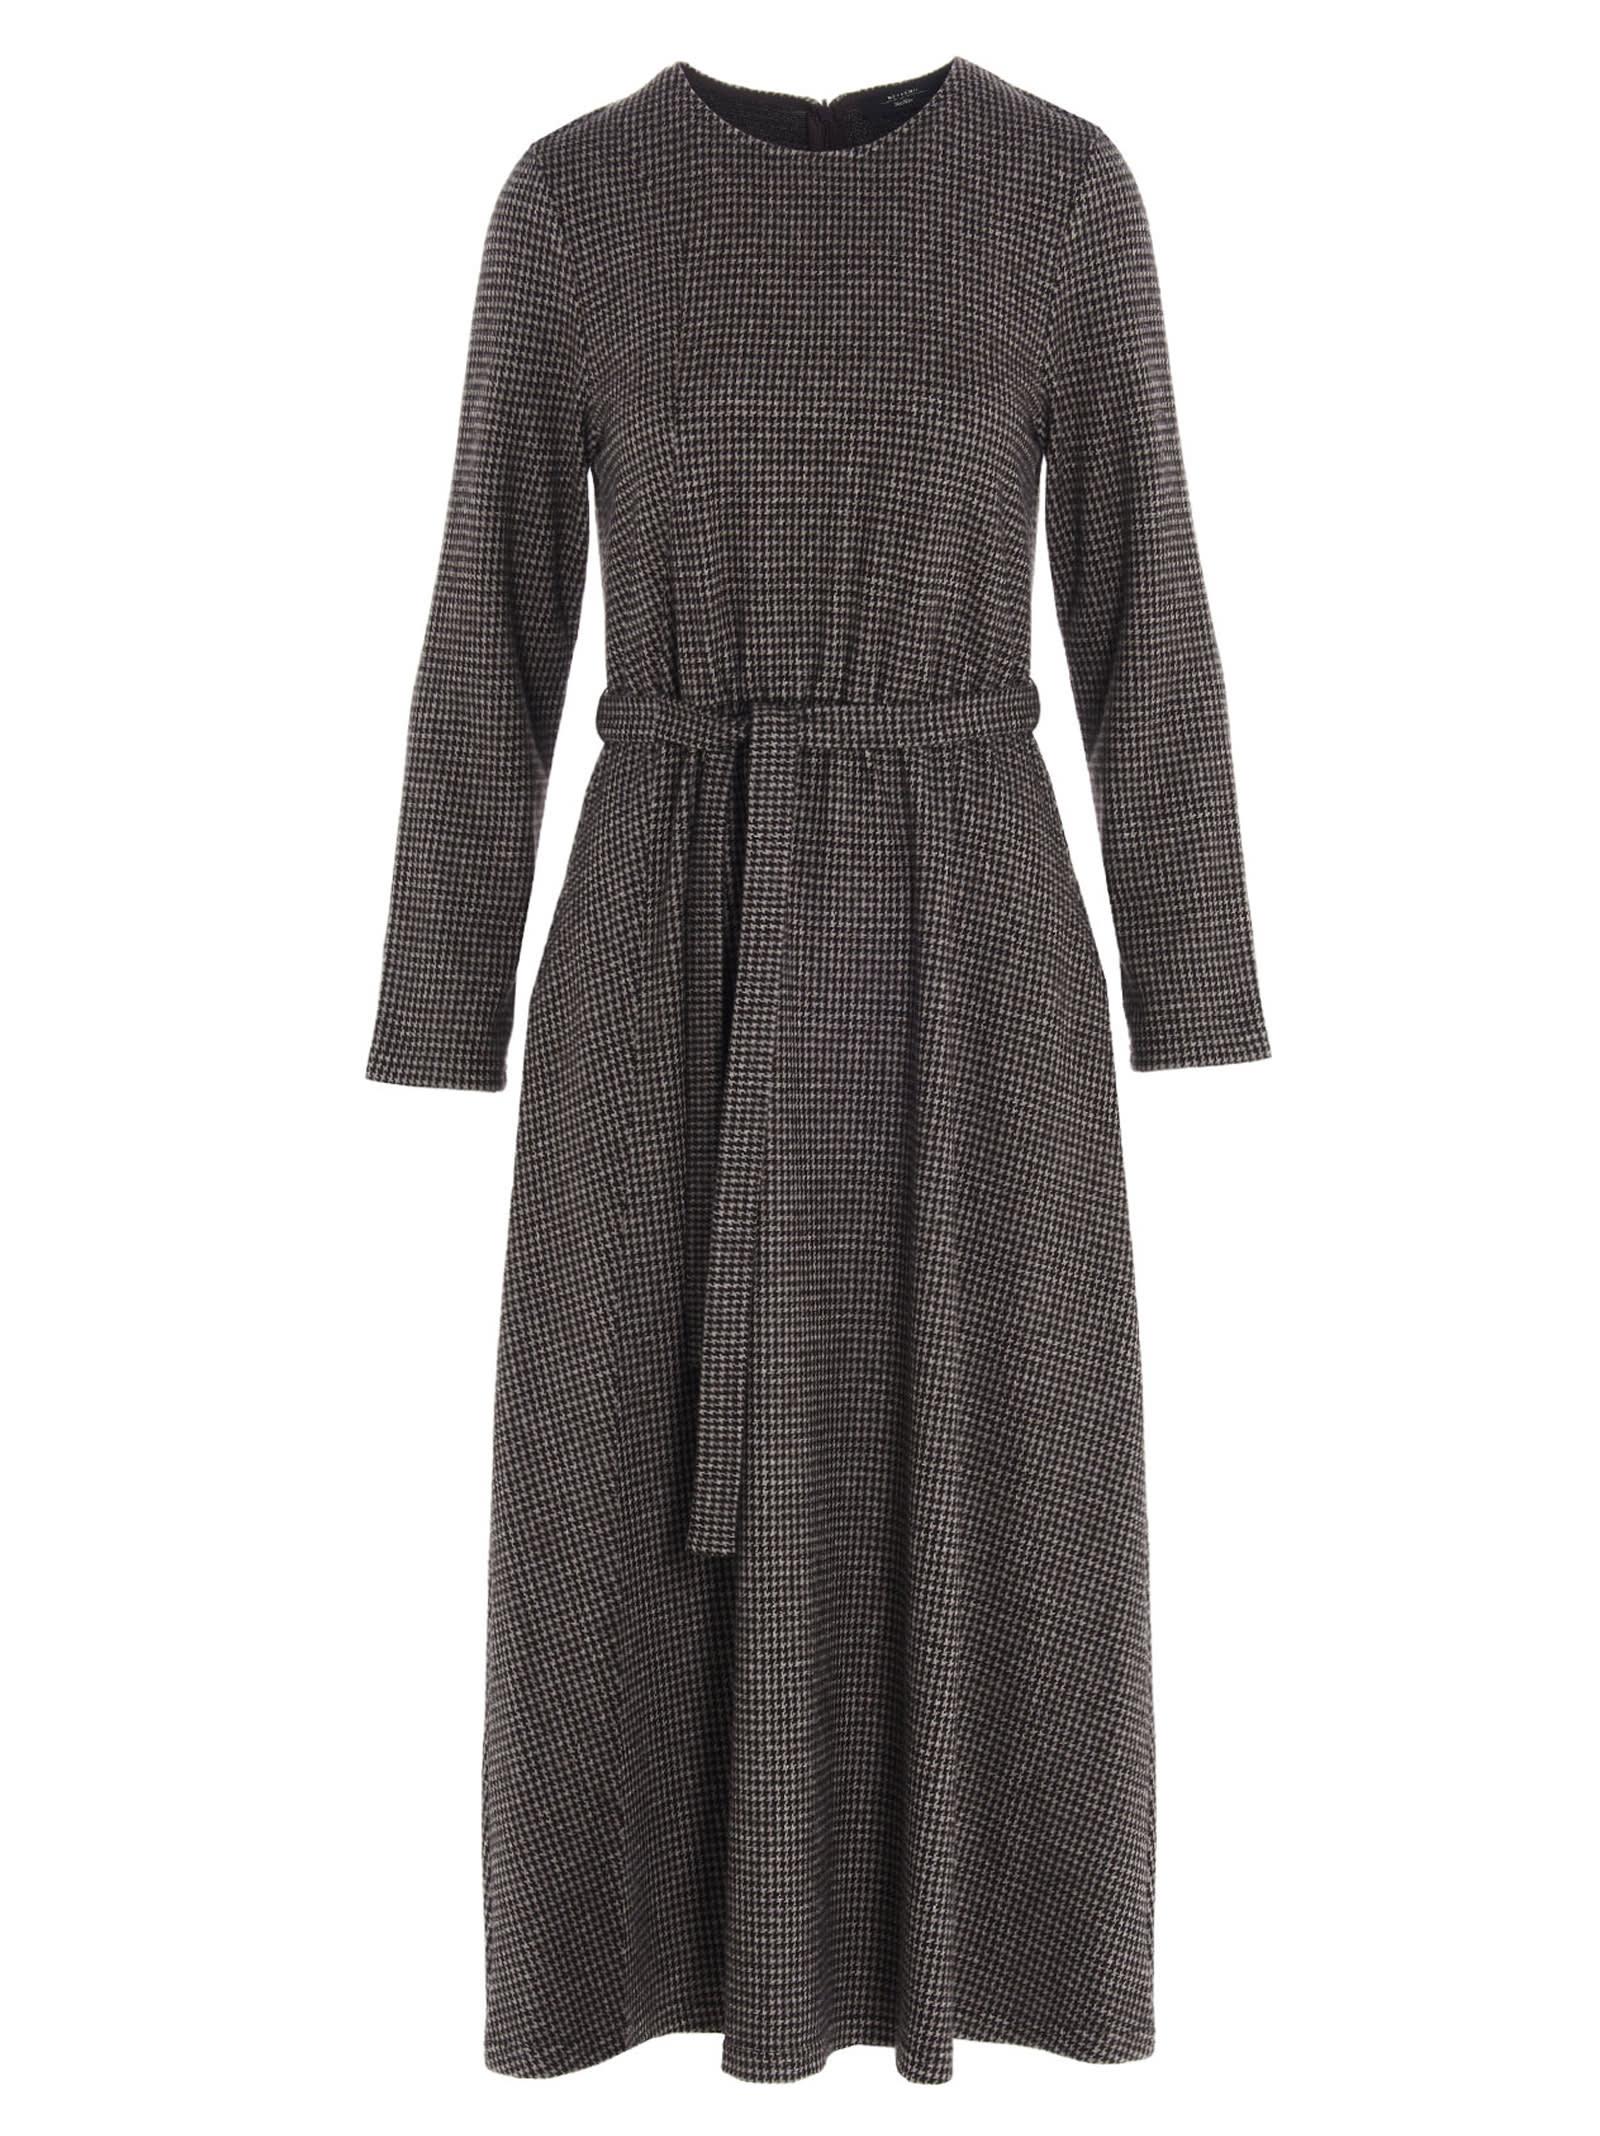 Buy Weekend Max Mara pascia Dress online, shop Weekend Max Mara with free shipping